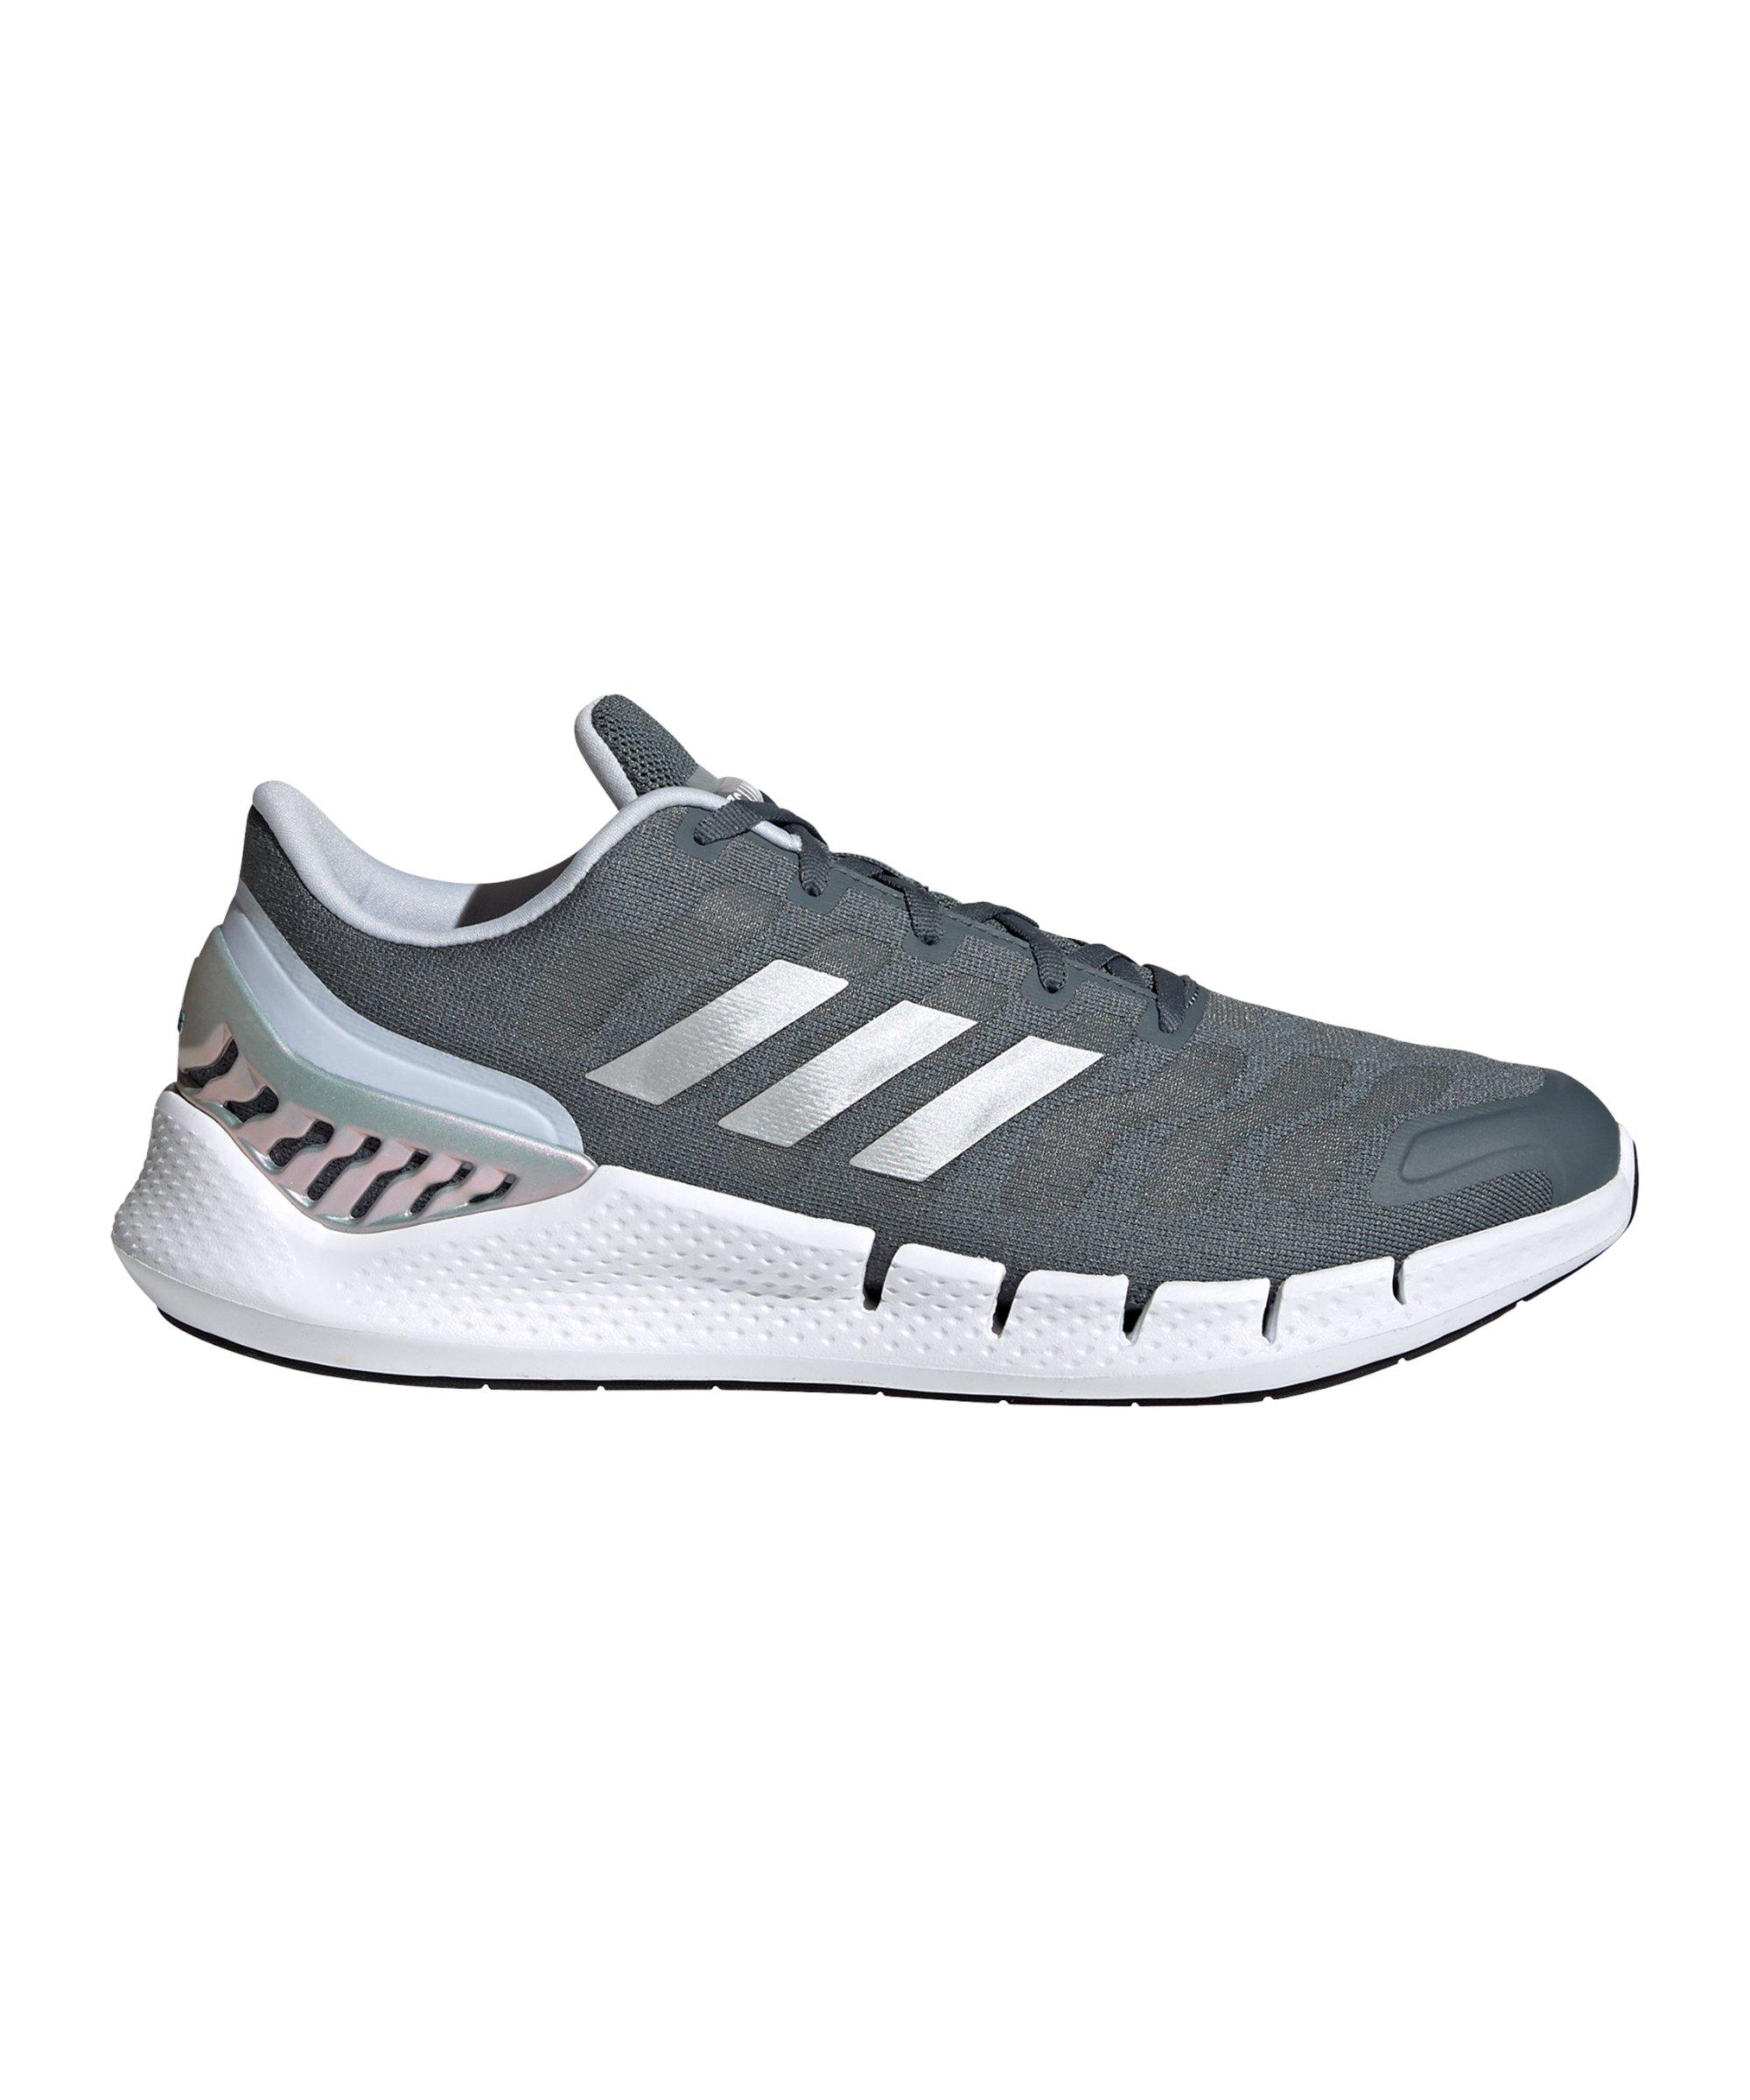 adidas Climacool Ventania Running Blau Grau Weiss - blau